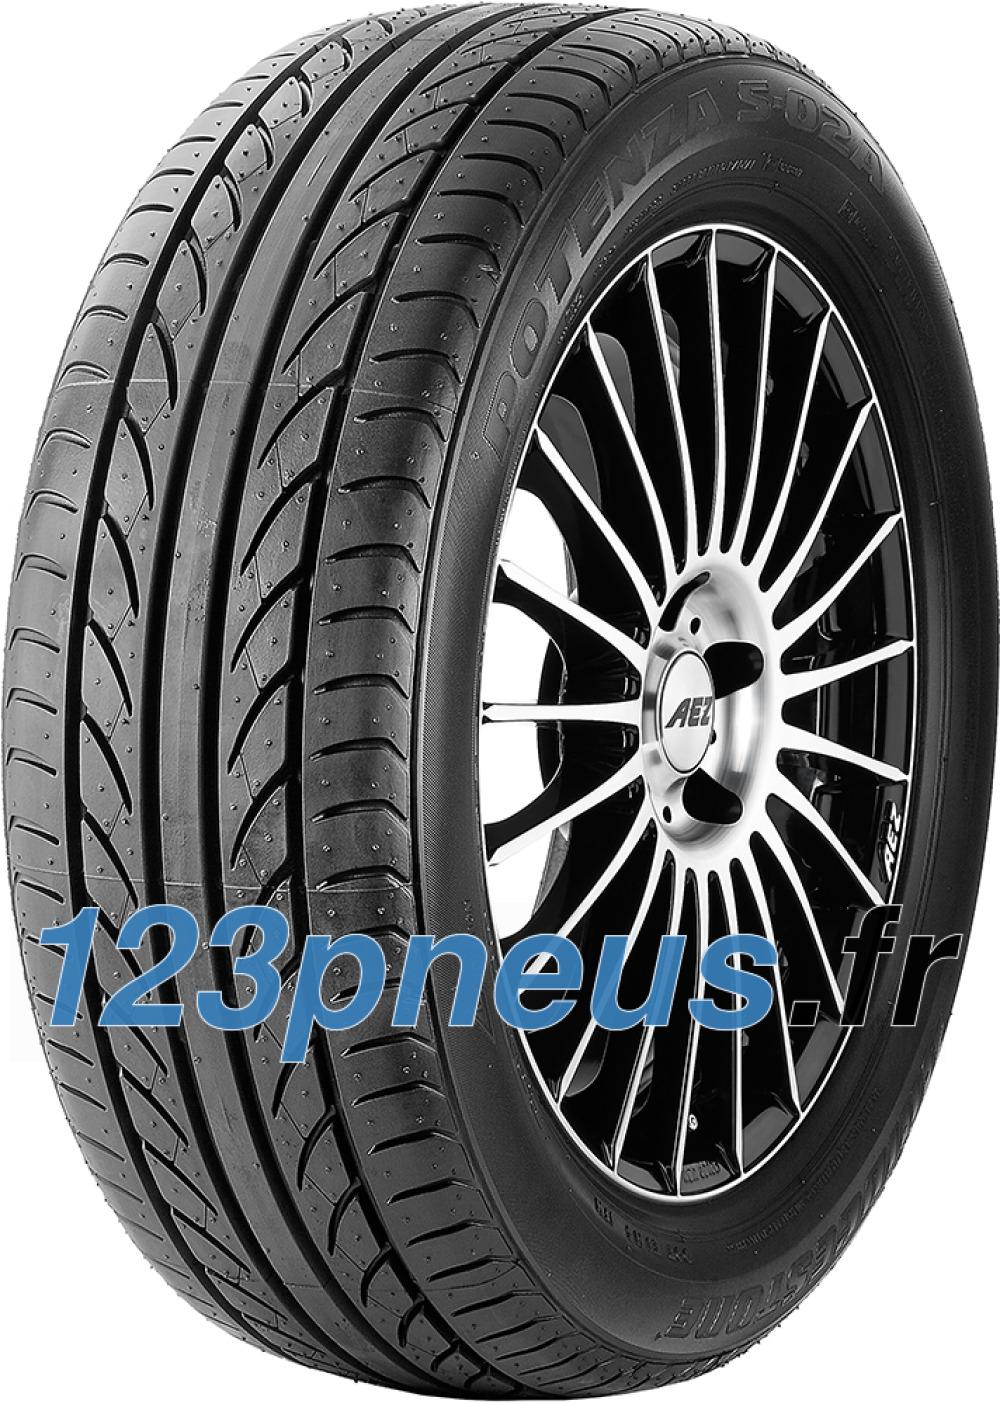 Bridgestone Potenza S02A